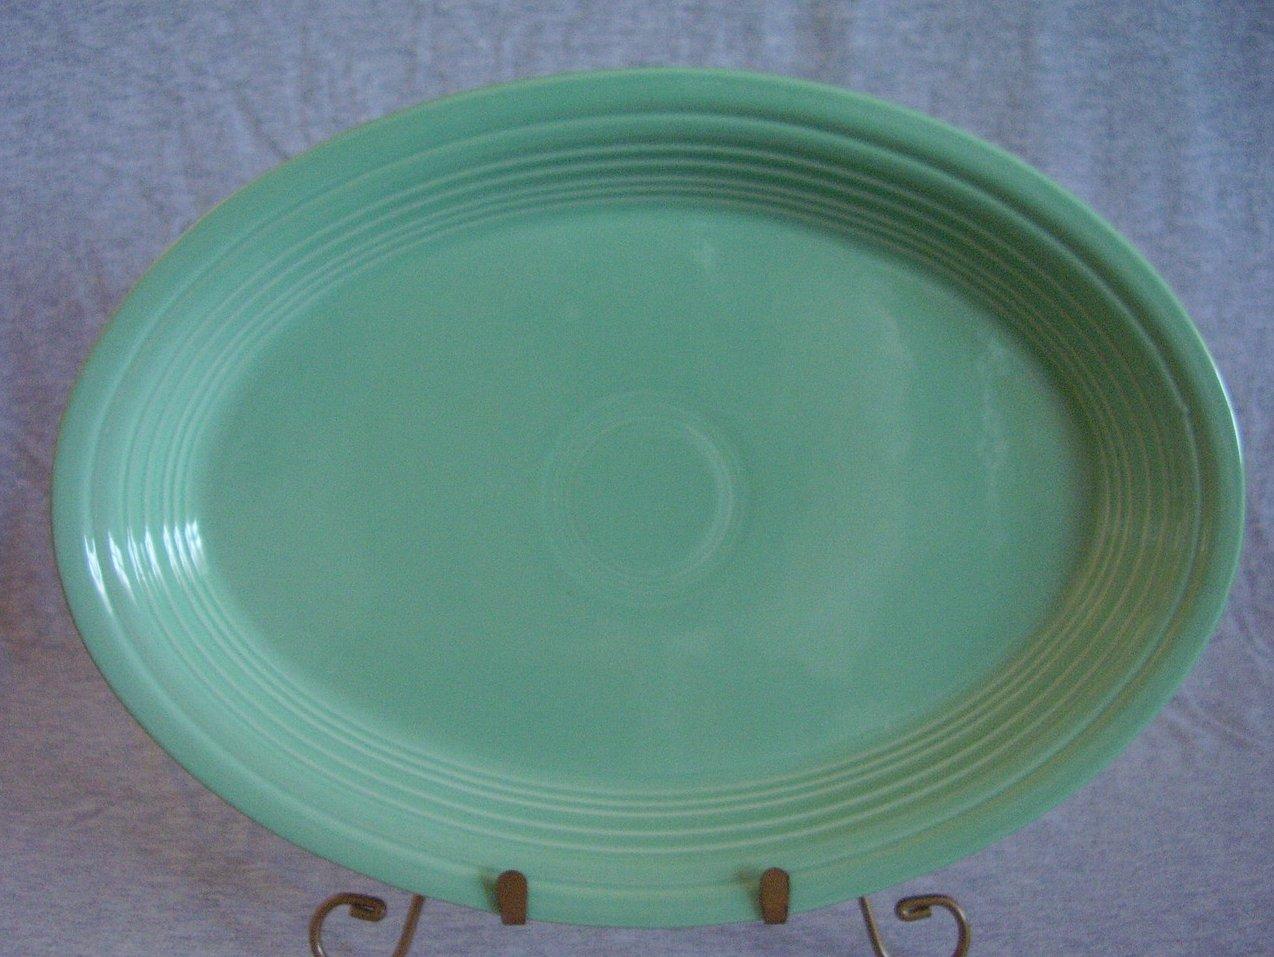 Fiesta Seamist Oval Platter Fiestaware Contemporary